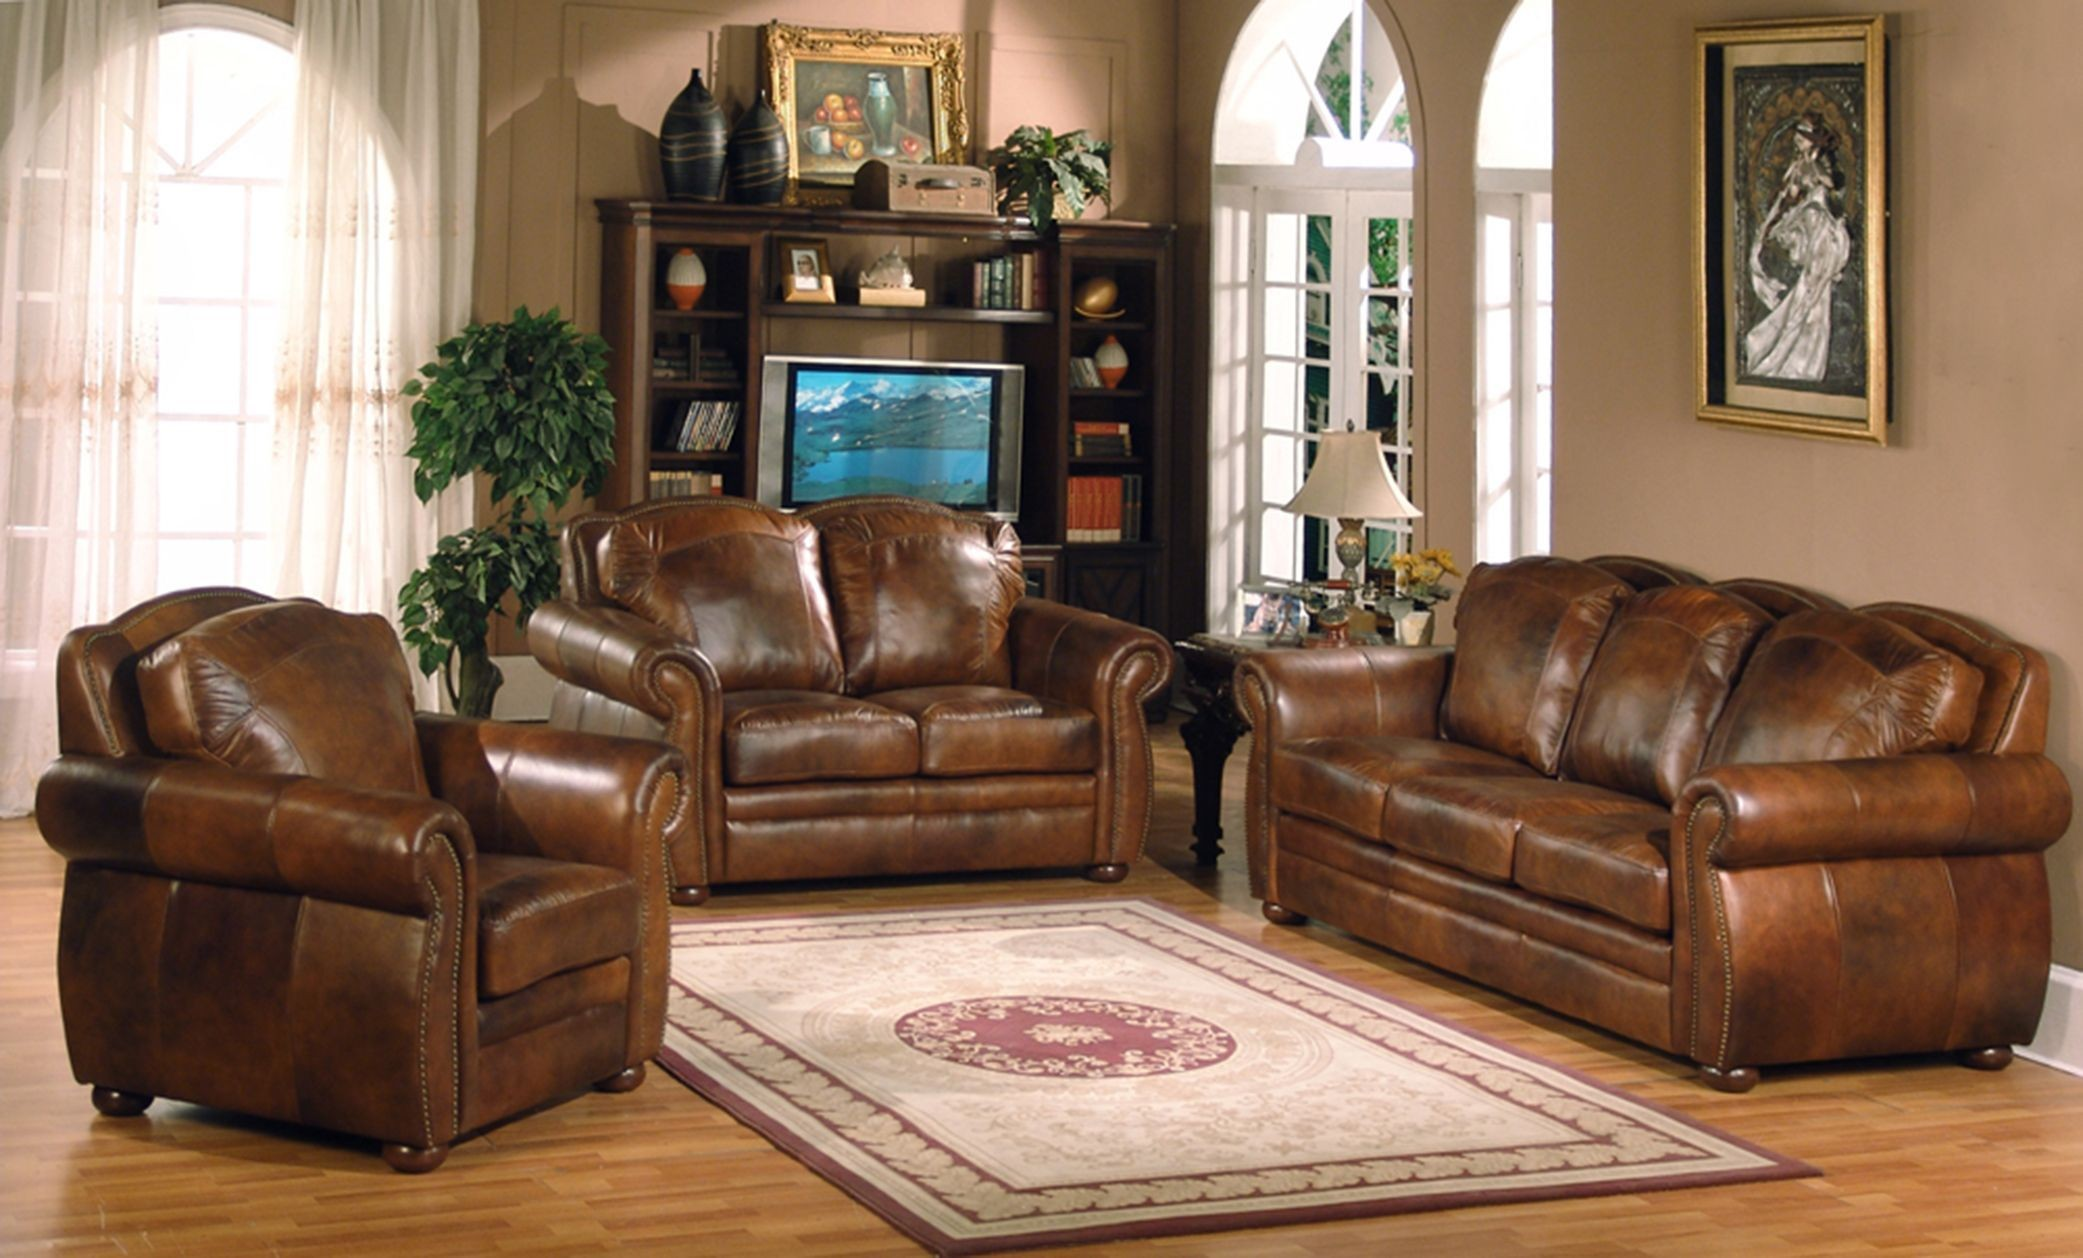 leather italia sofa furniture tufted memory foam reviews arizona marco living room set from (1444 ...